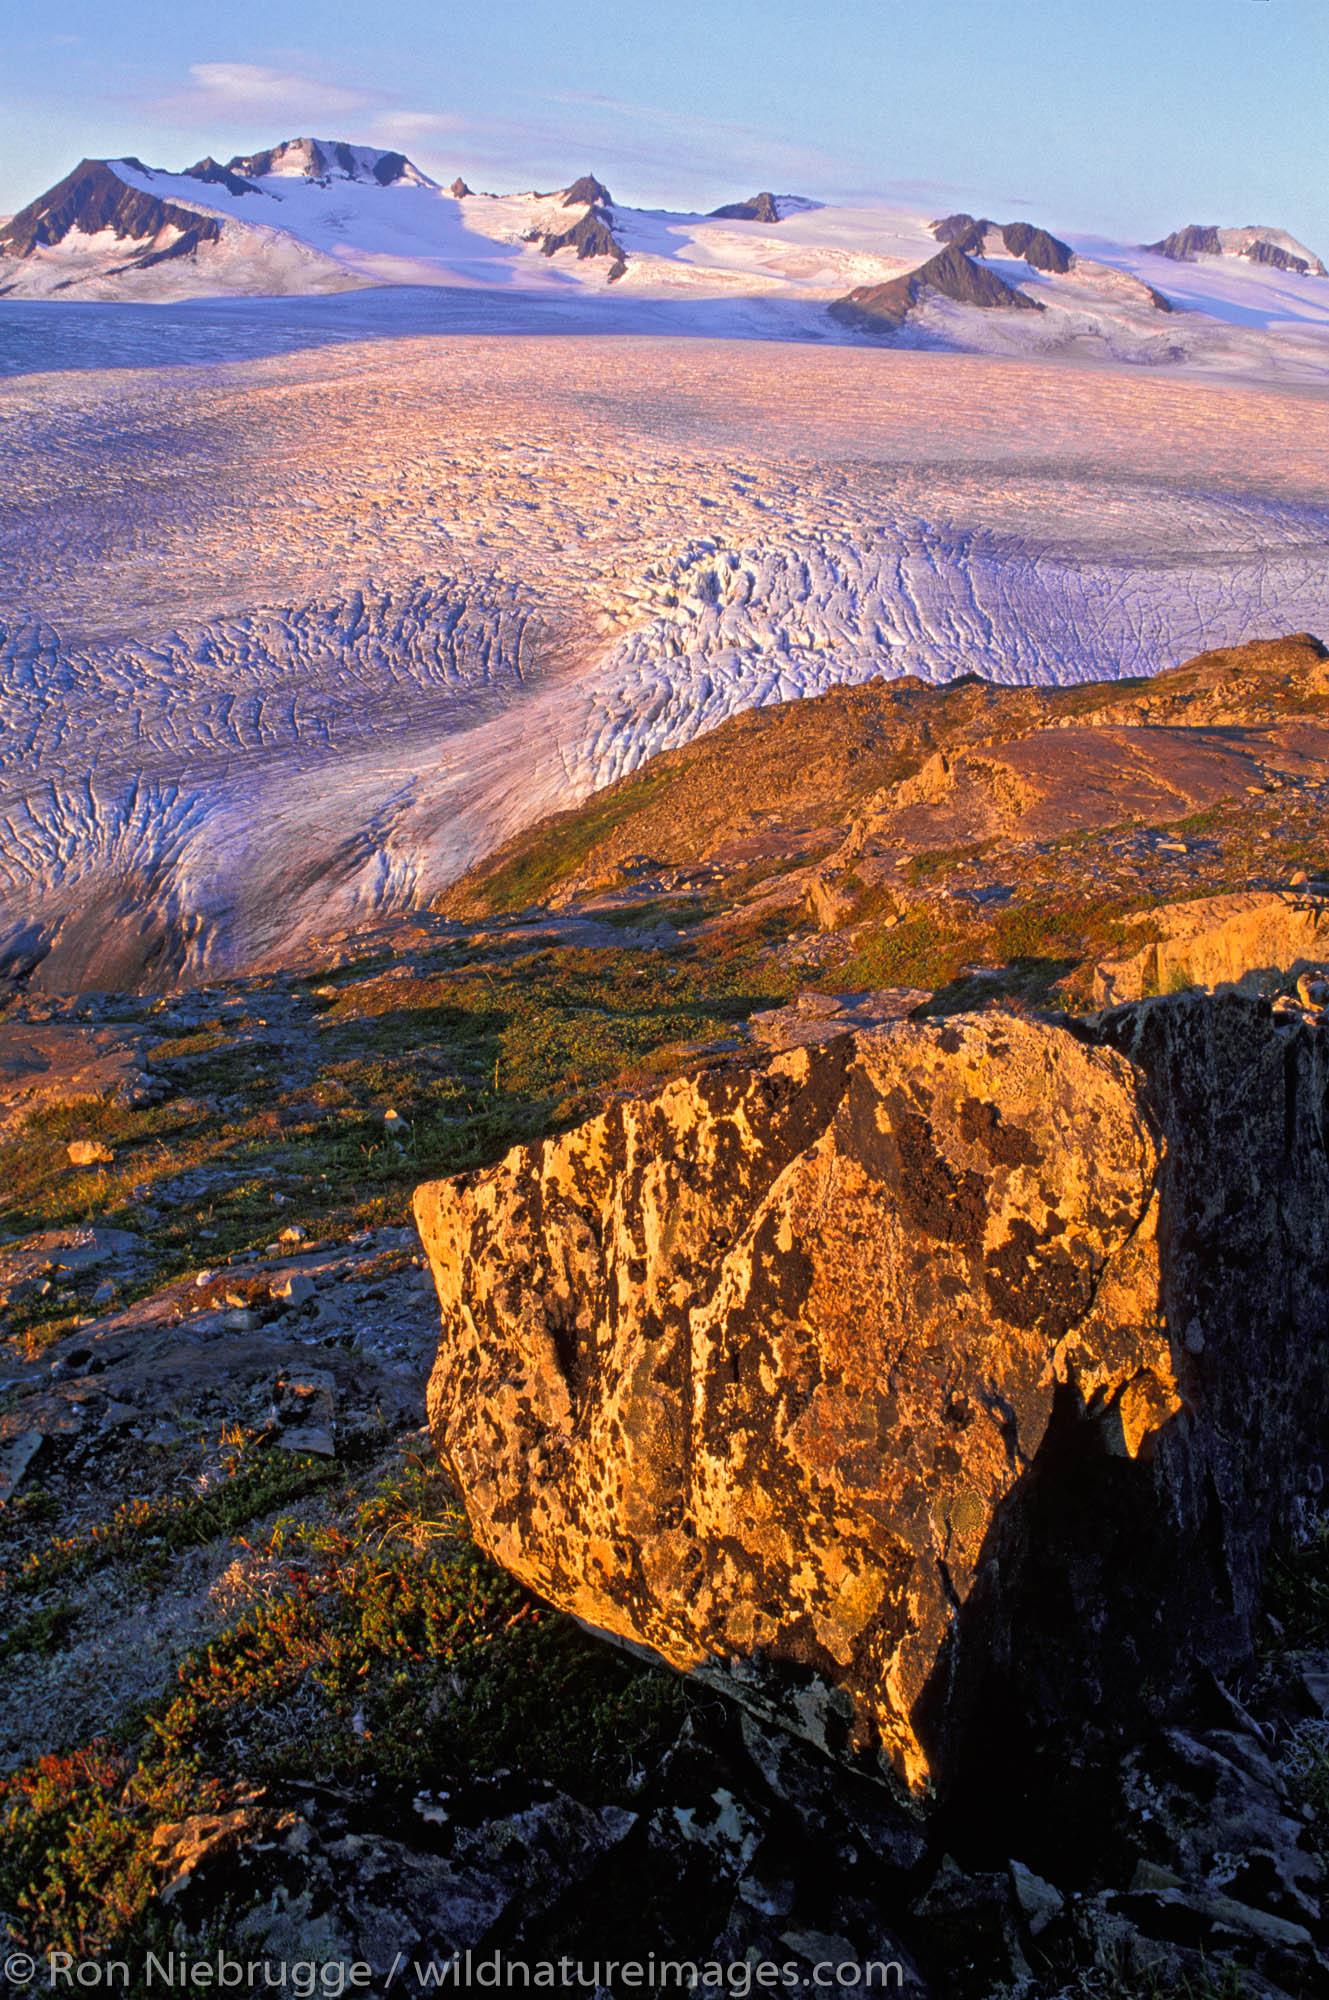 The Harding Icefield and Exit Glacier at sunrise, Kenai Fjords National Park, Alaska.